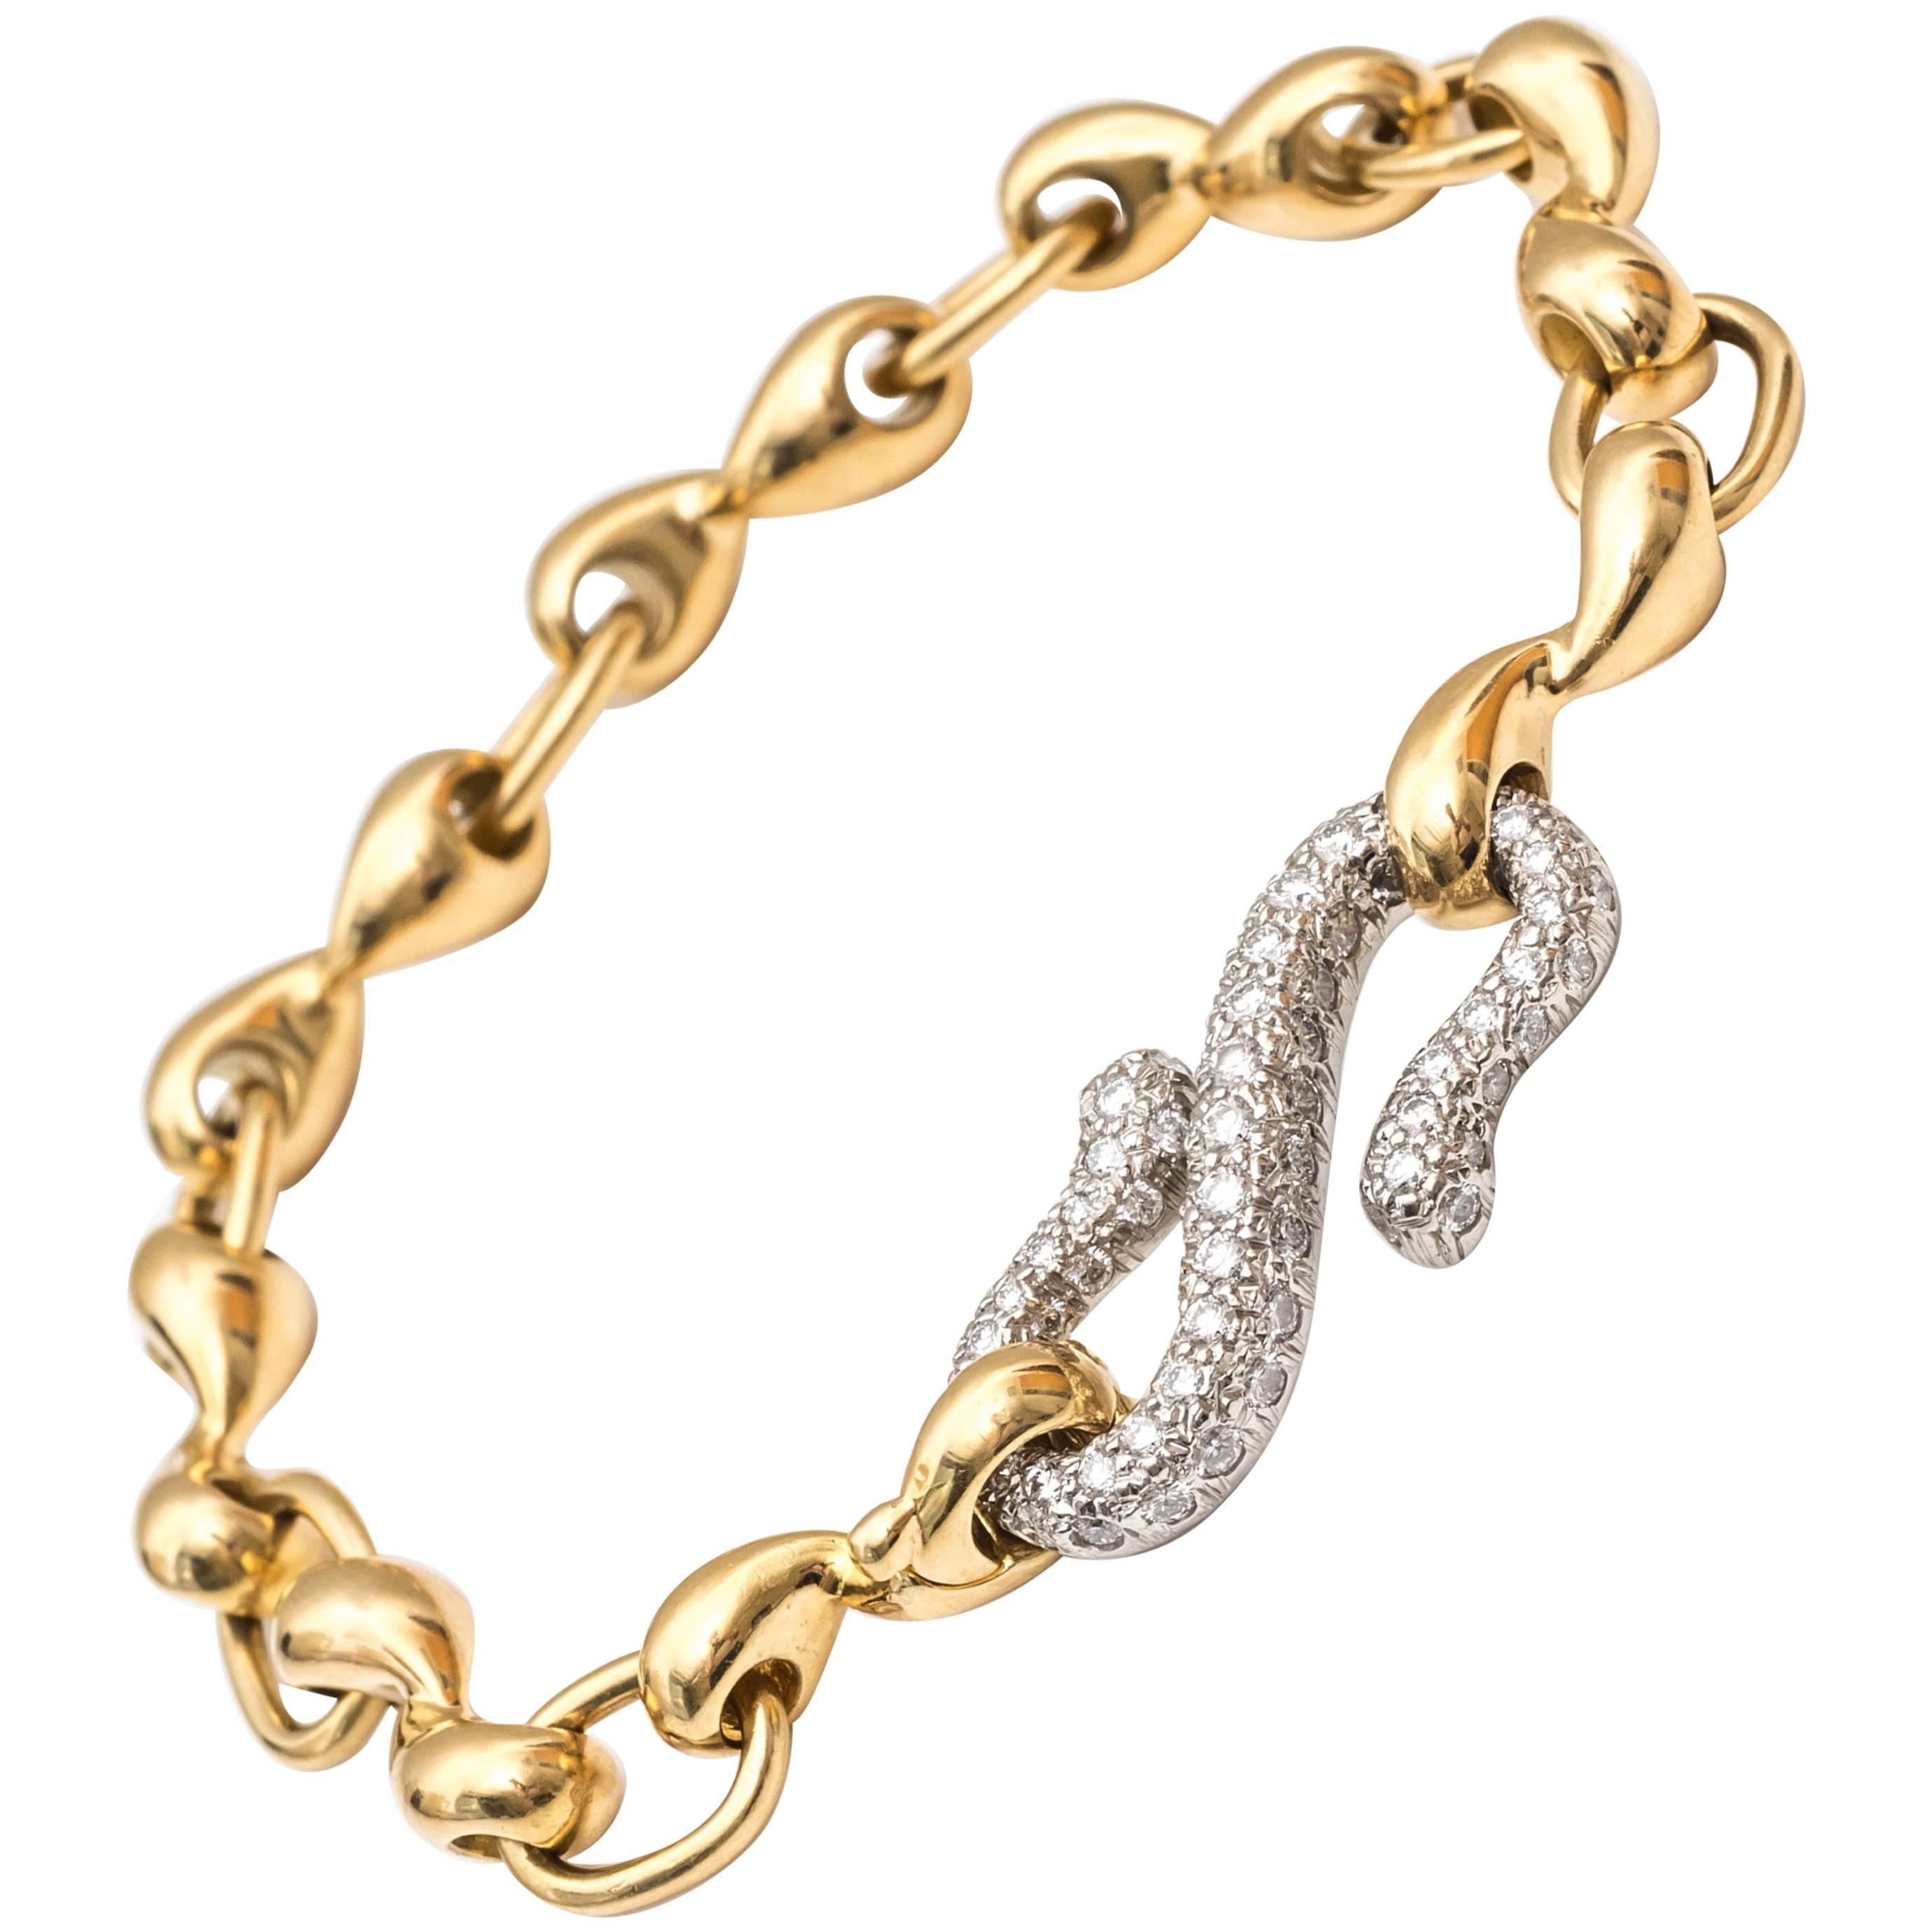 1990s Tiffany & Co. Diamond Platinum Bracelet